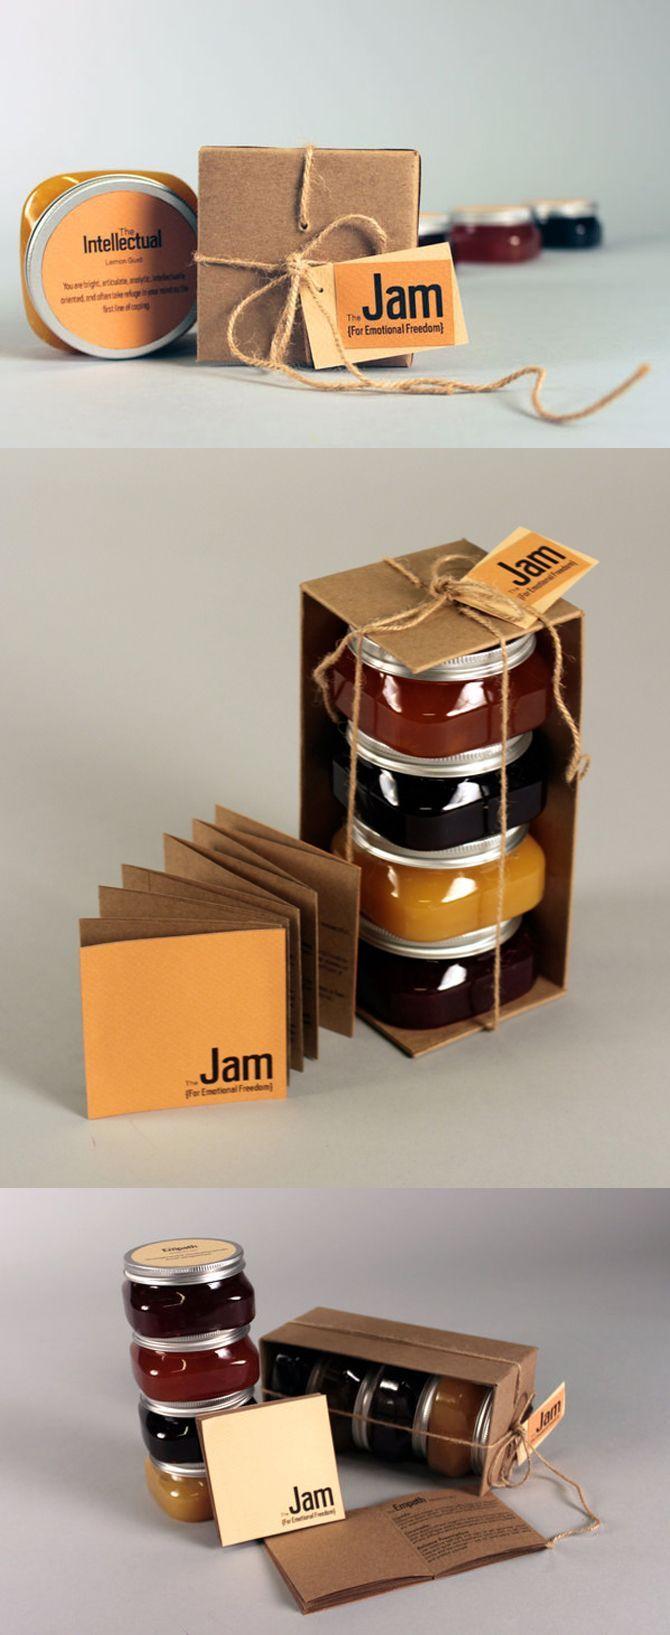 Jam Packaging Designs For Inspiration - We Design Packaging